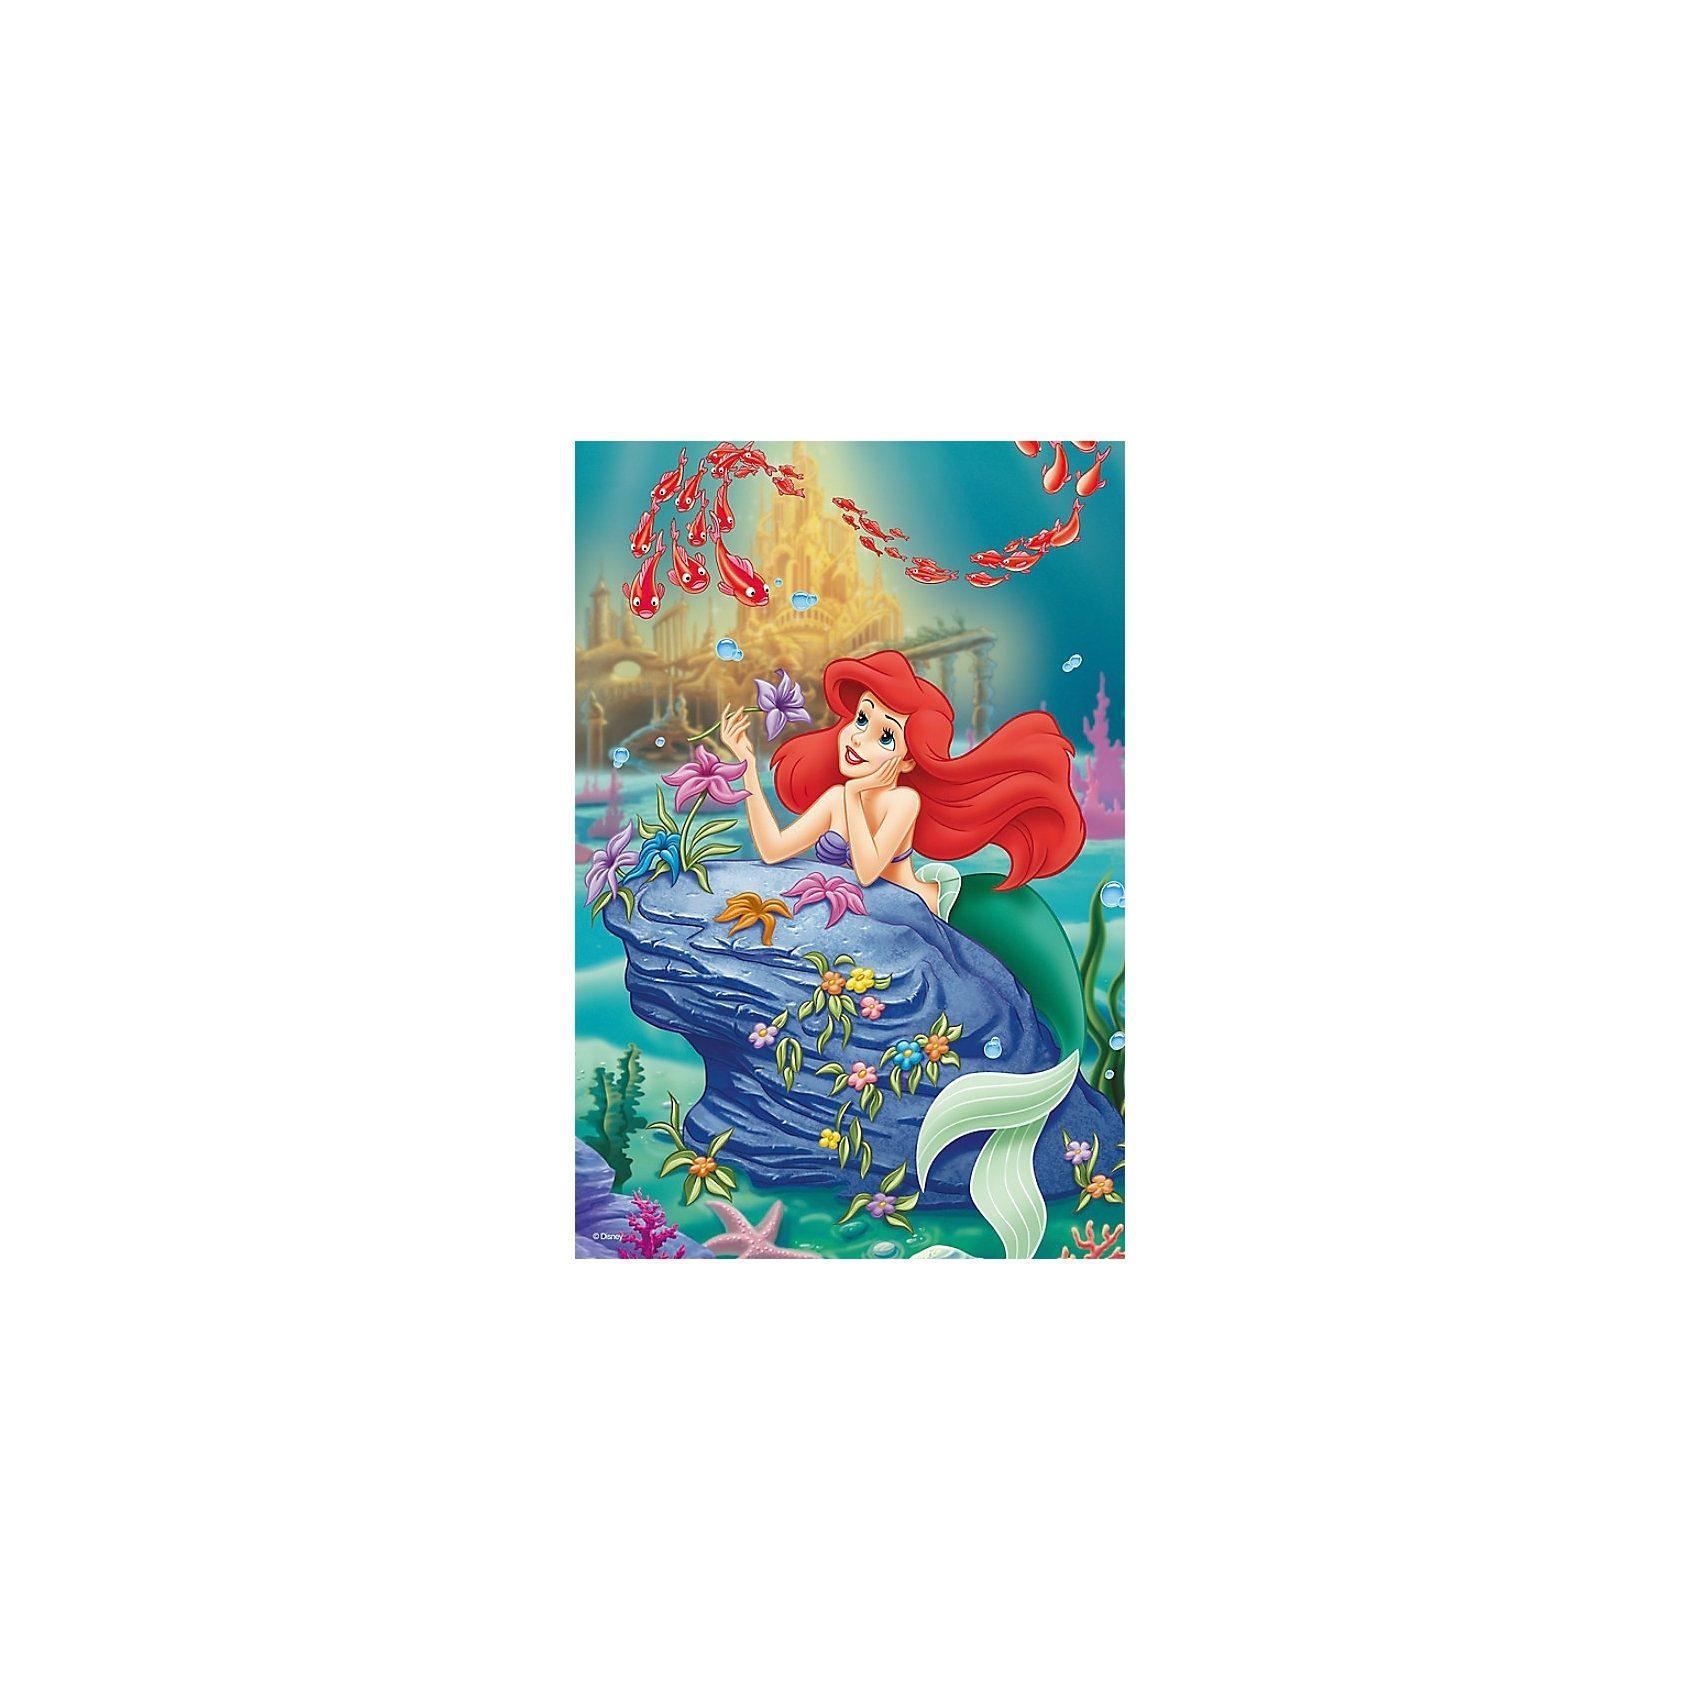 Trefl Puzzle 260 Teile - Disney Princess Arielle